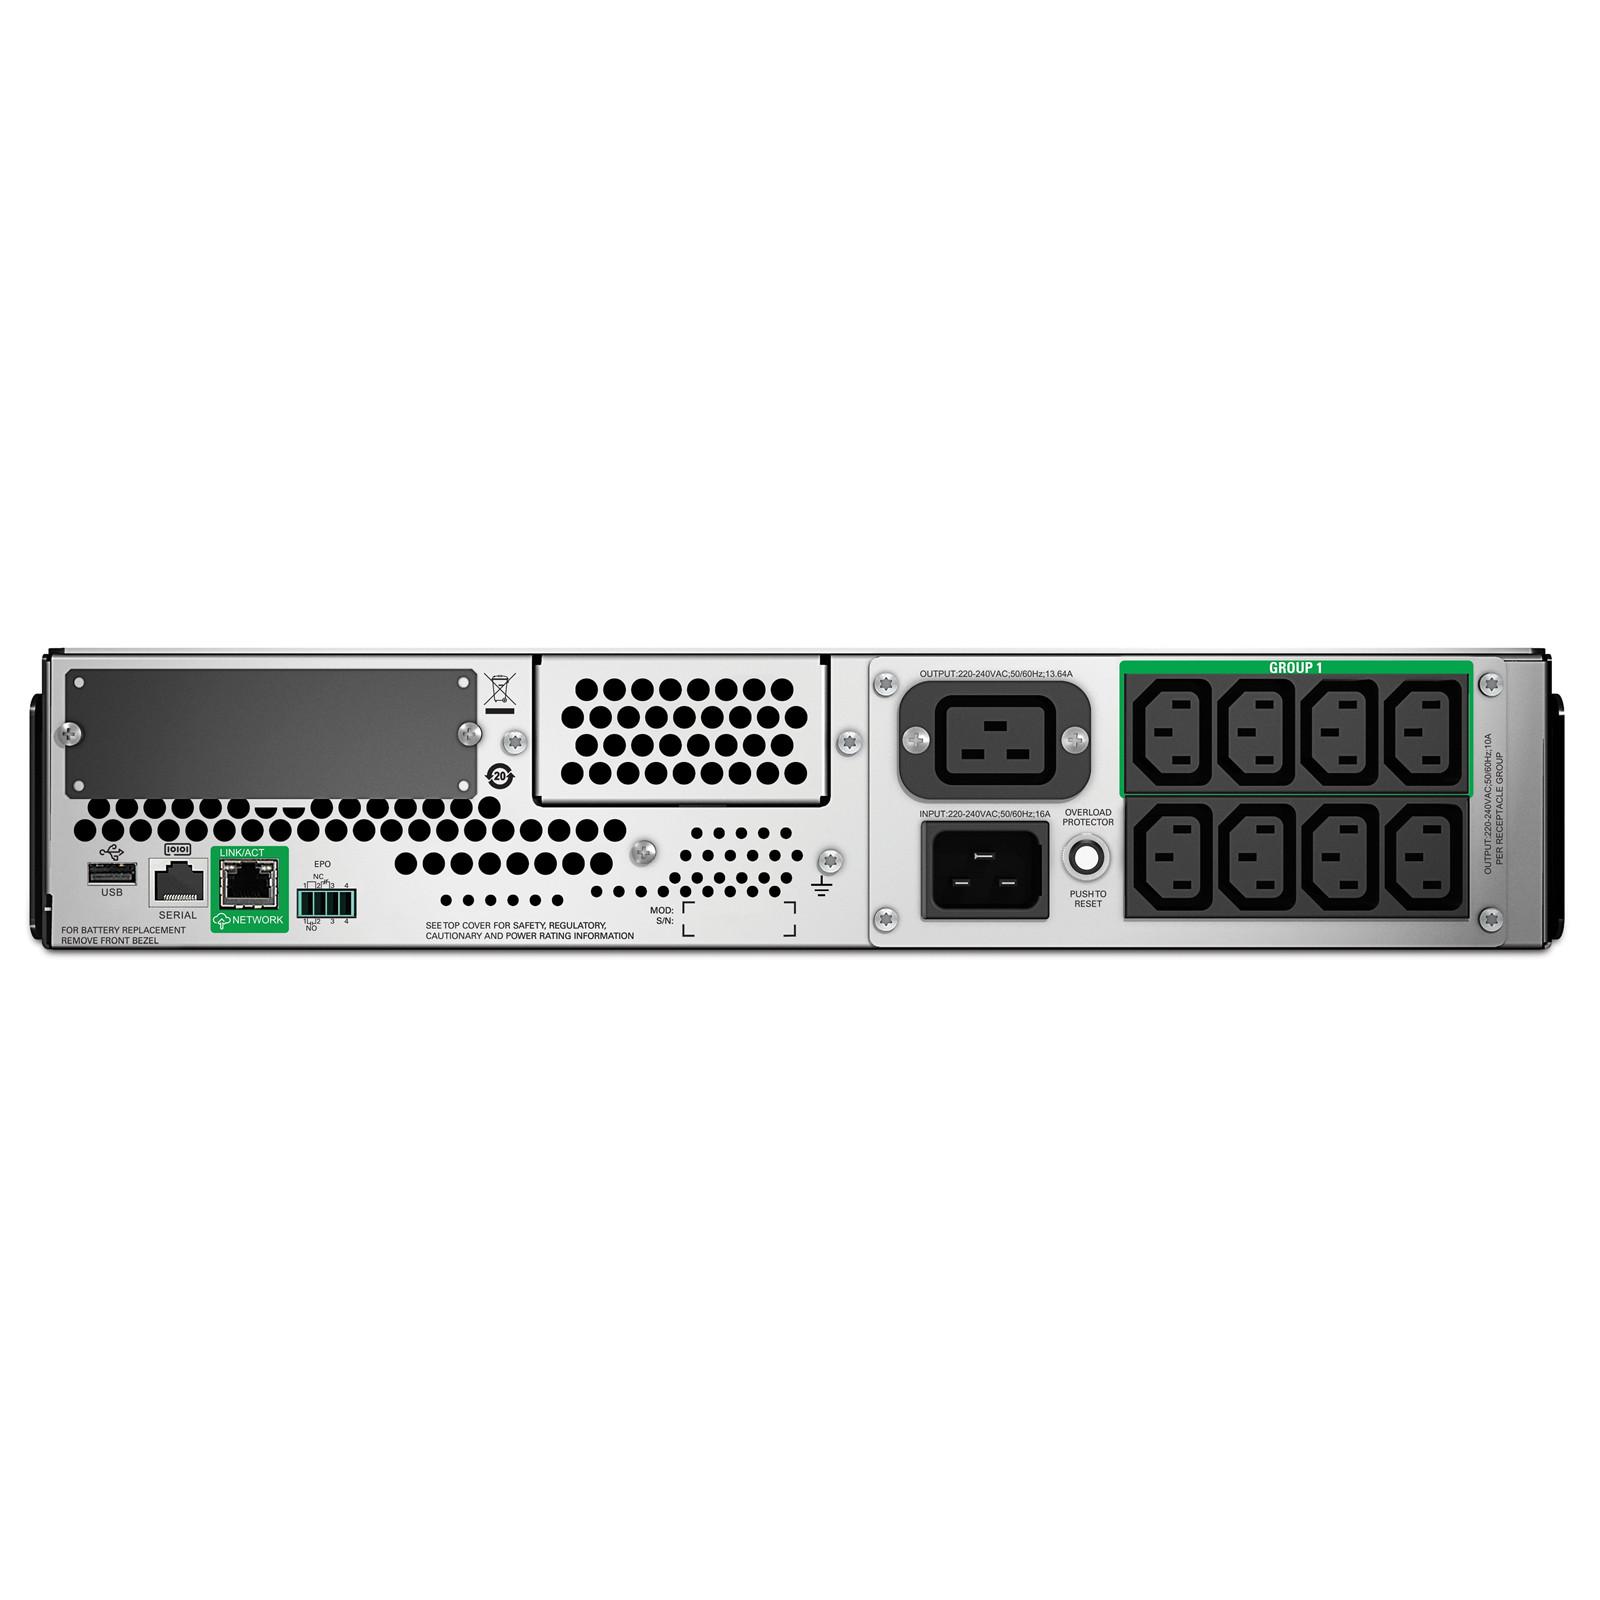 Buy the APC Smart UPS 3000VA LCD RM 2U 230V with